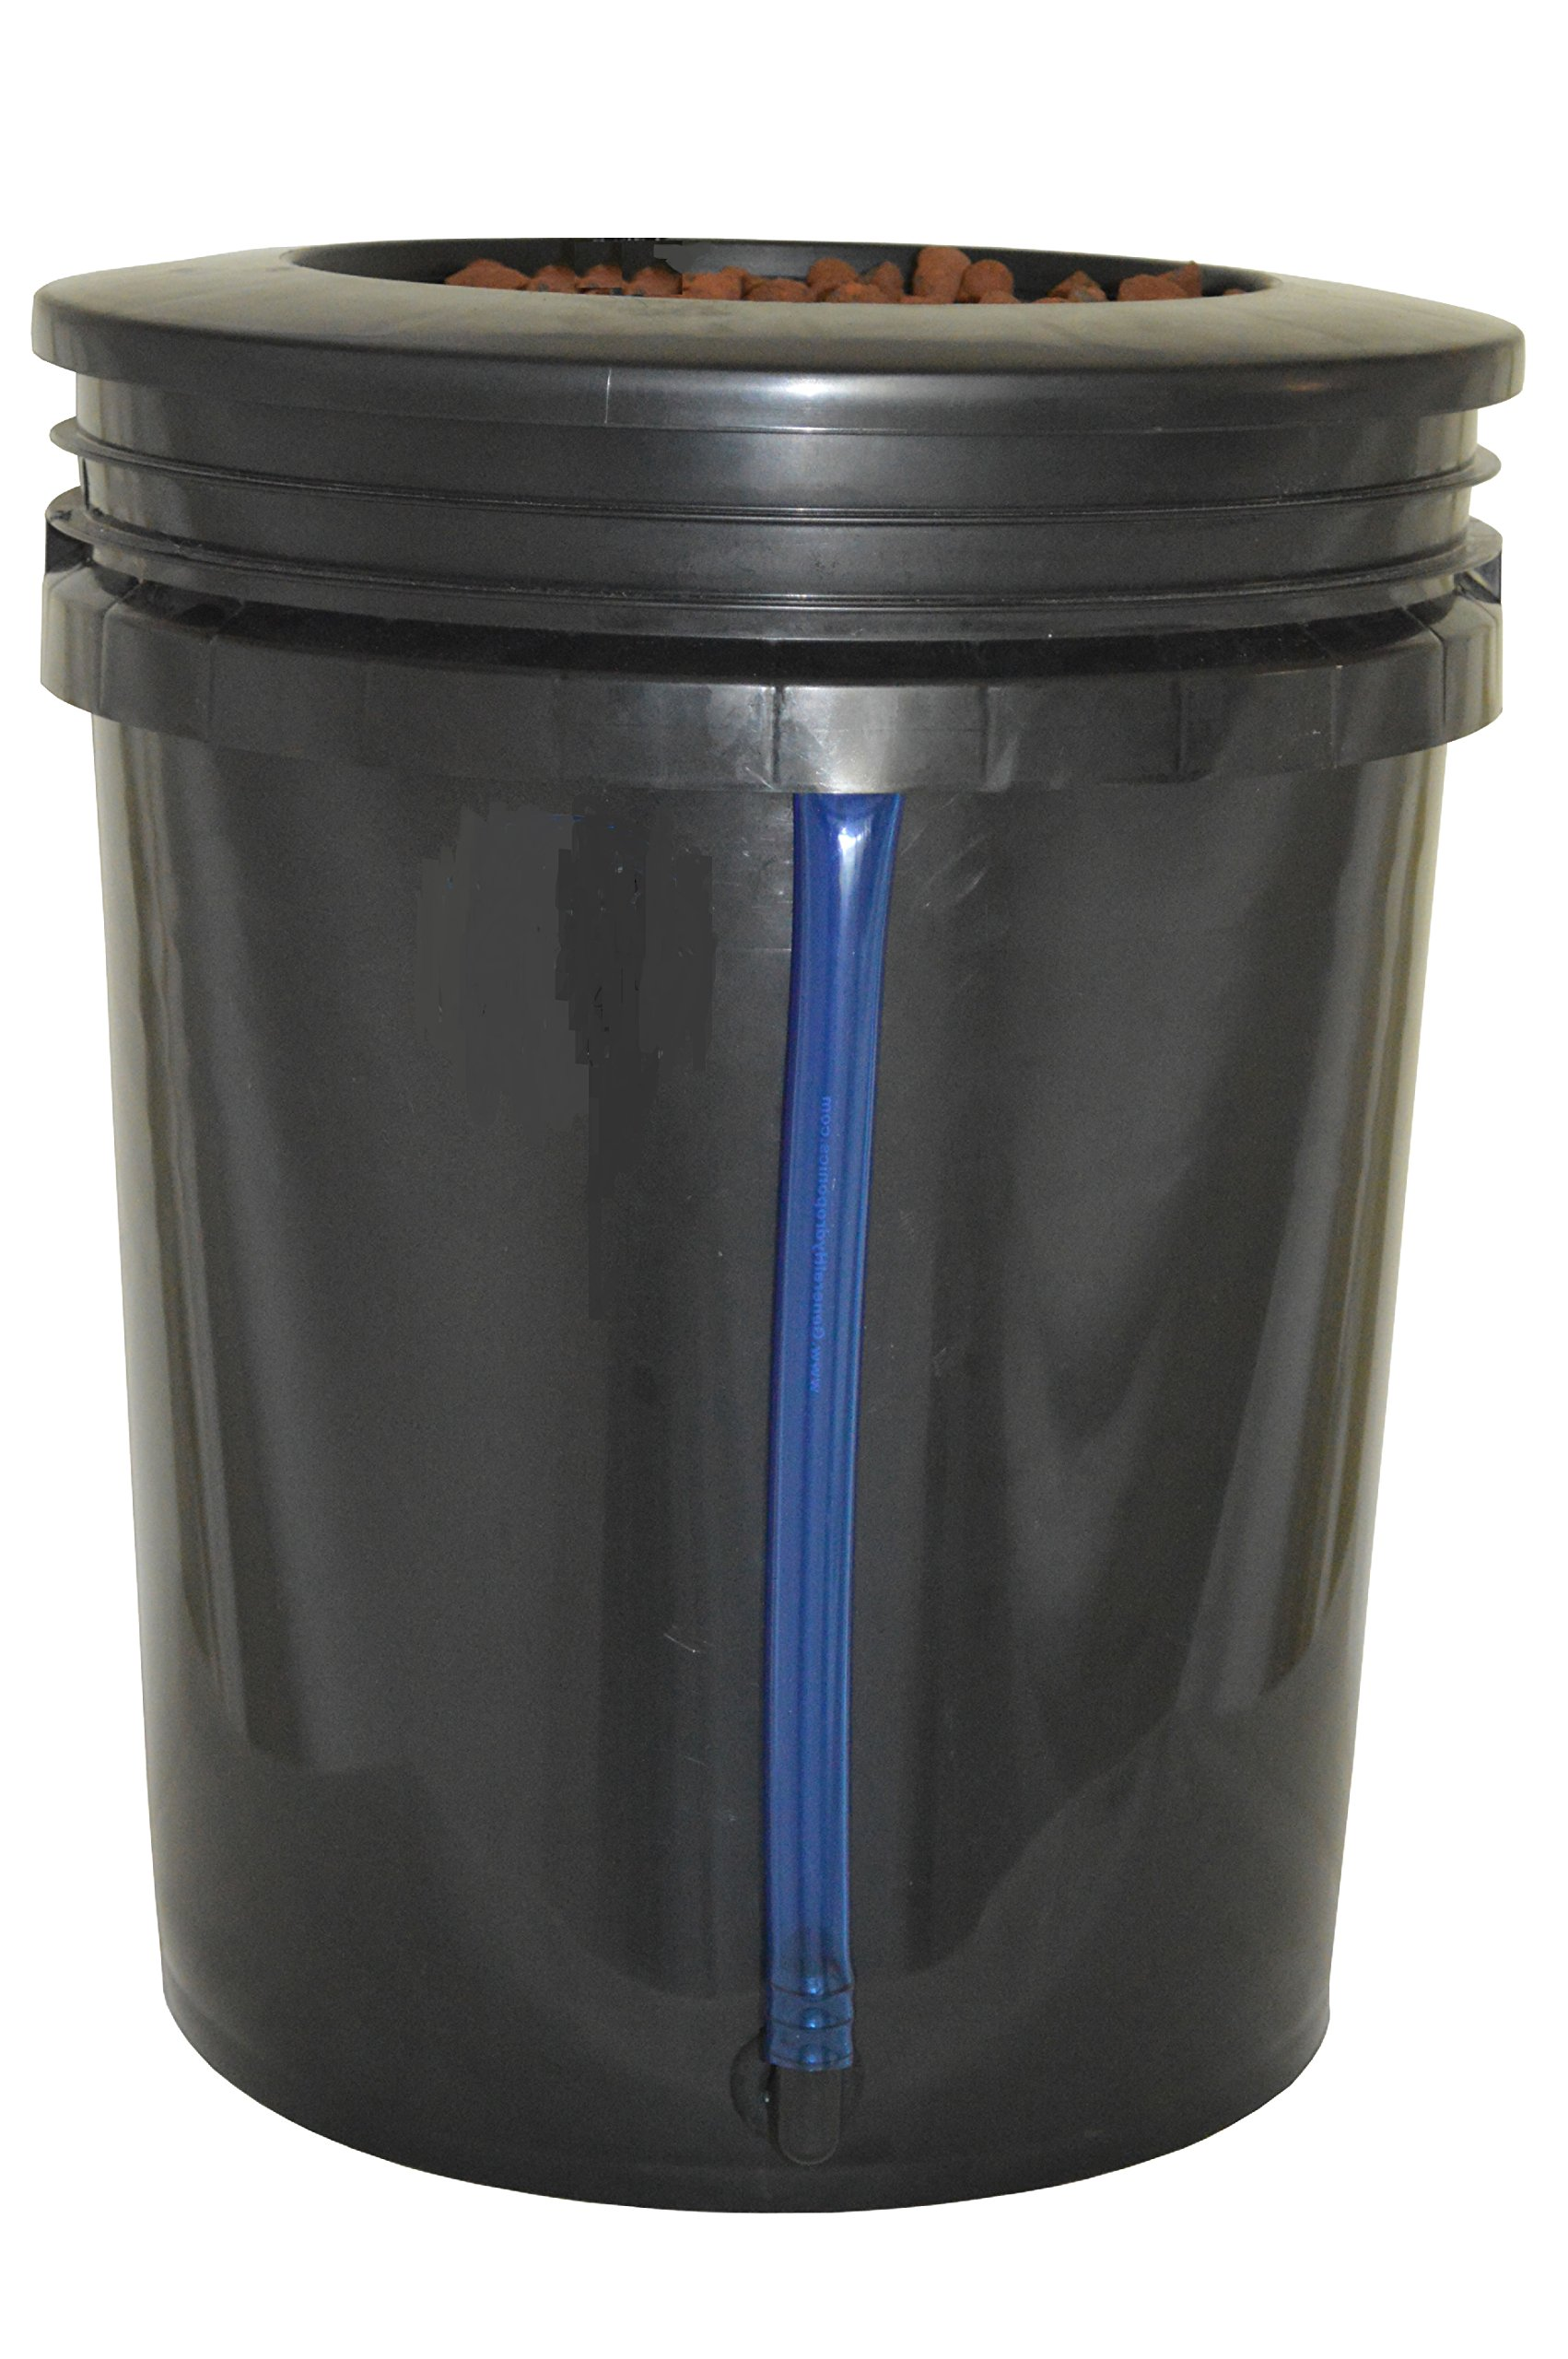 DWC 4-site Hydroponic Bucket BUBBLER Grow kit by H2OToGro (Image #2)